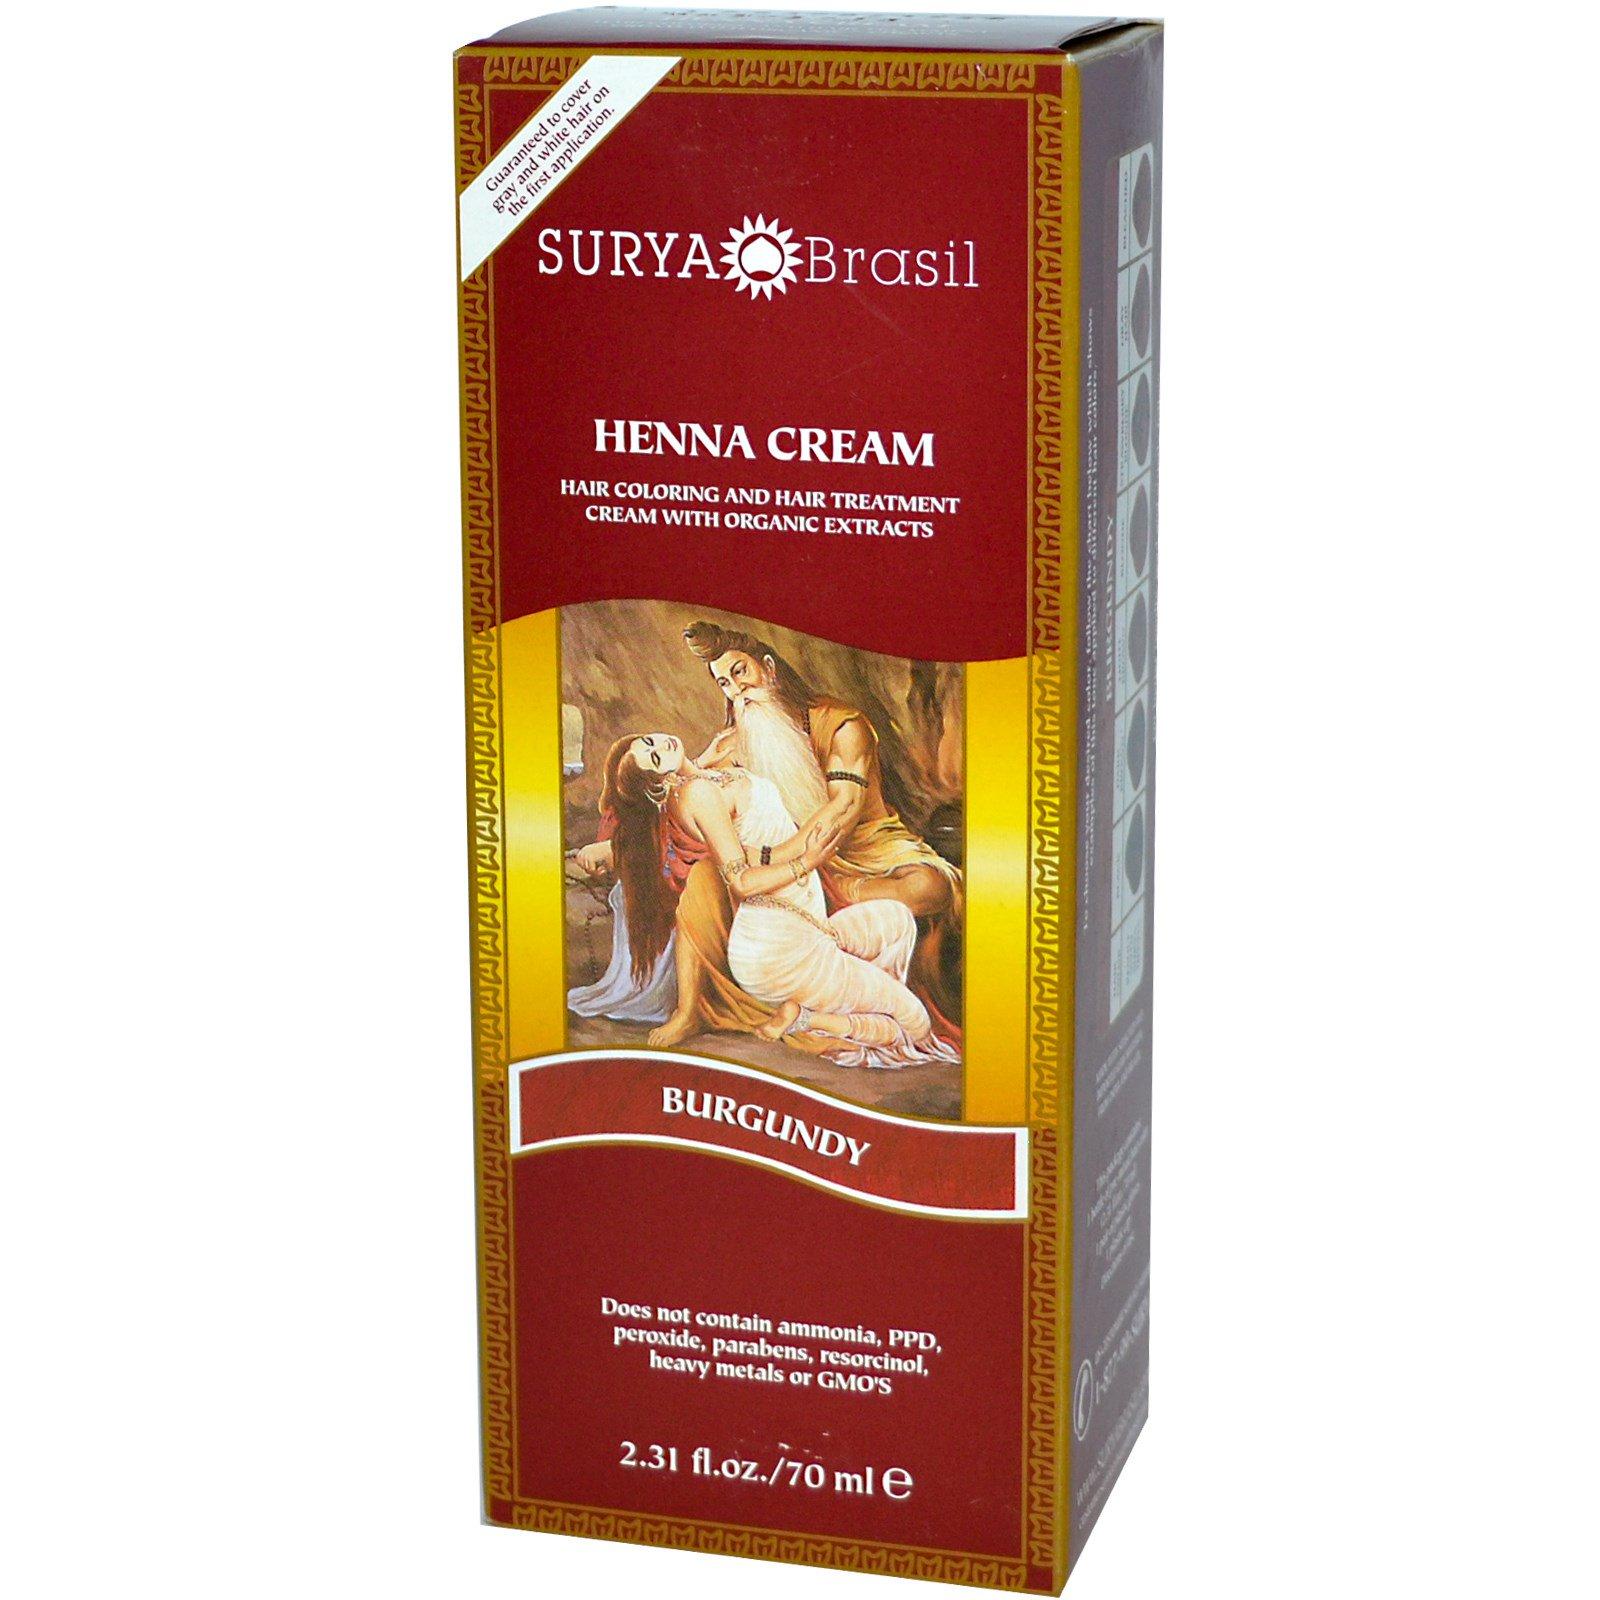 Surya Henna Henna Cream Hair Coloring Hair Treatment Burgundy